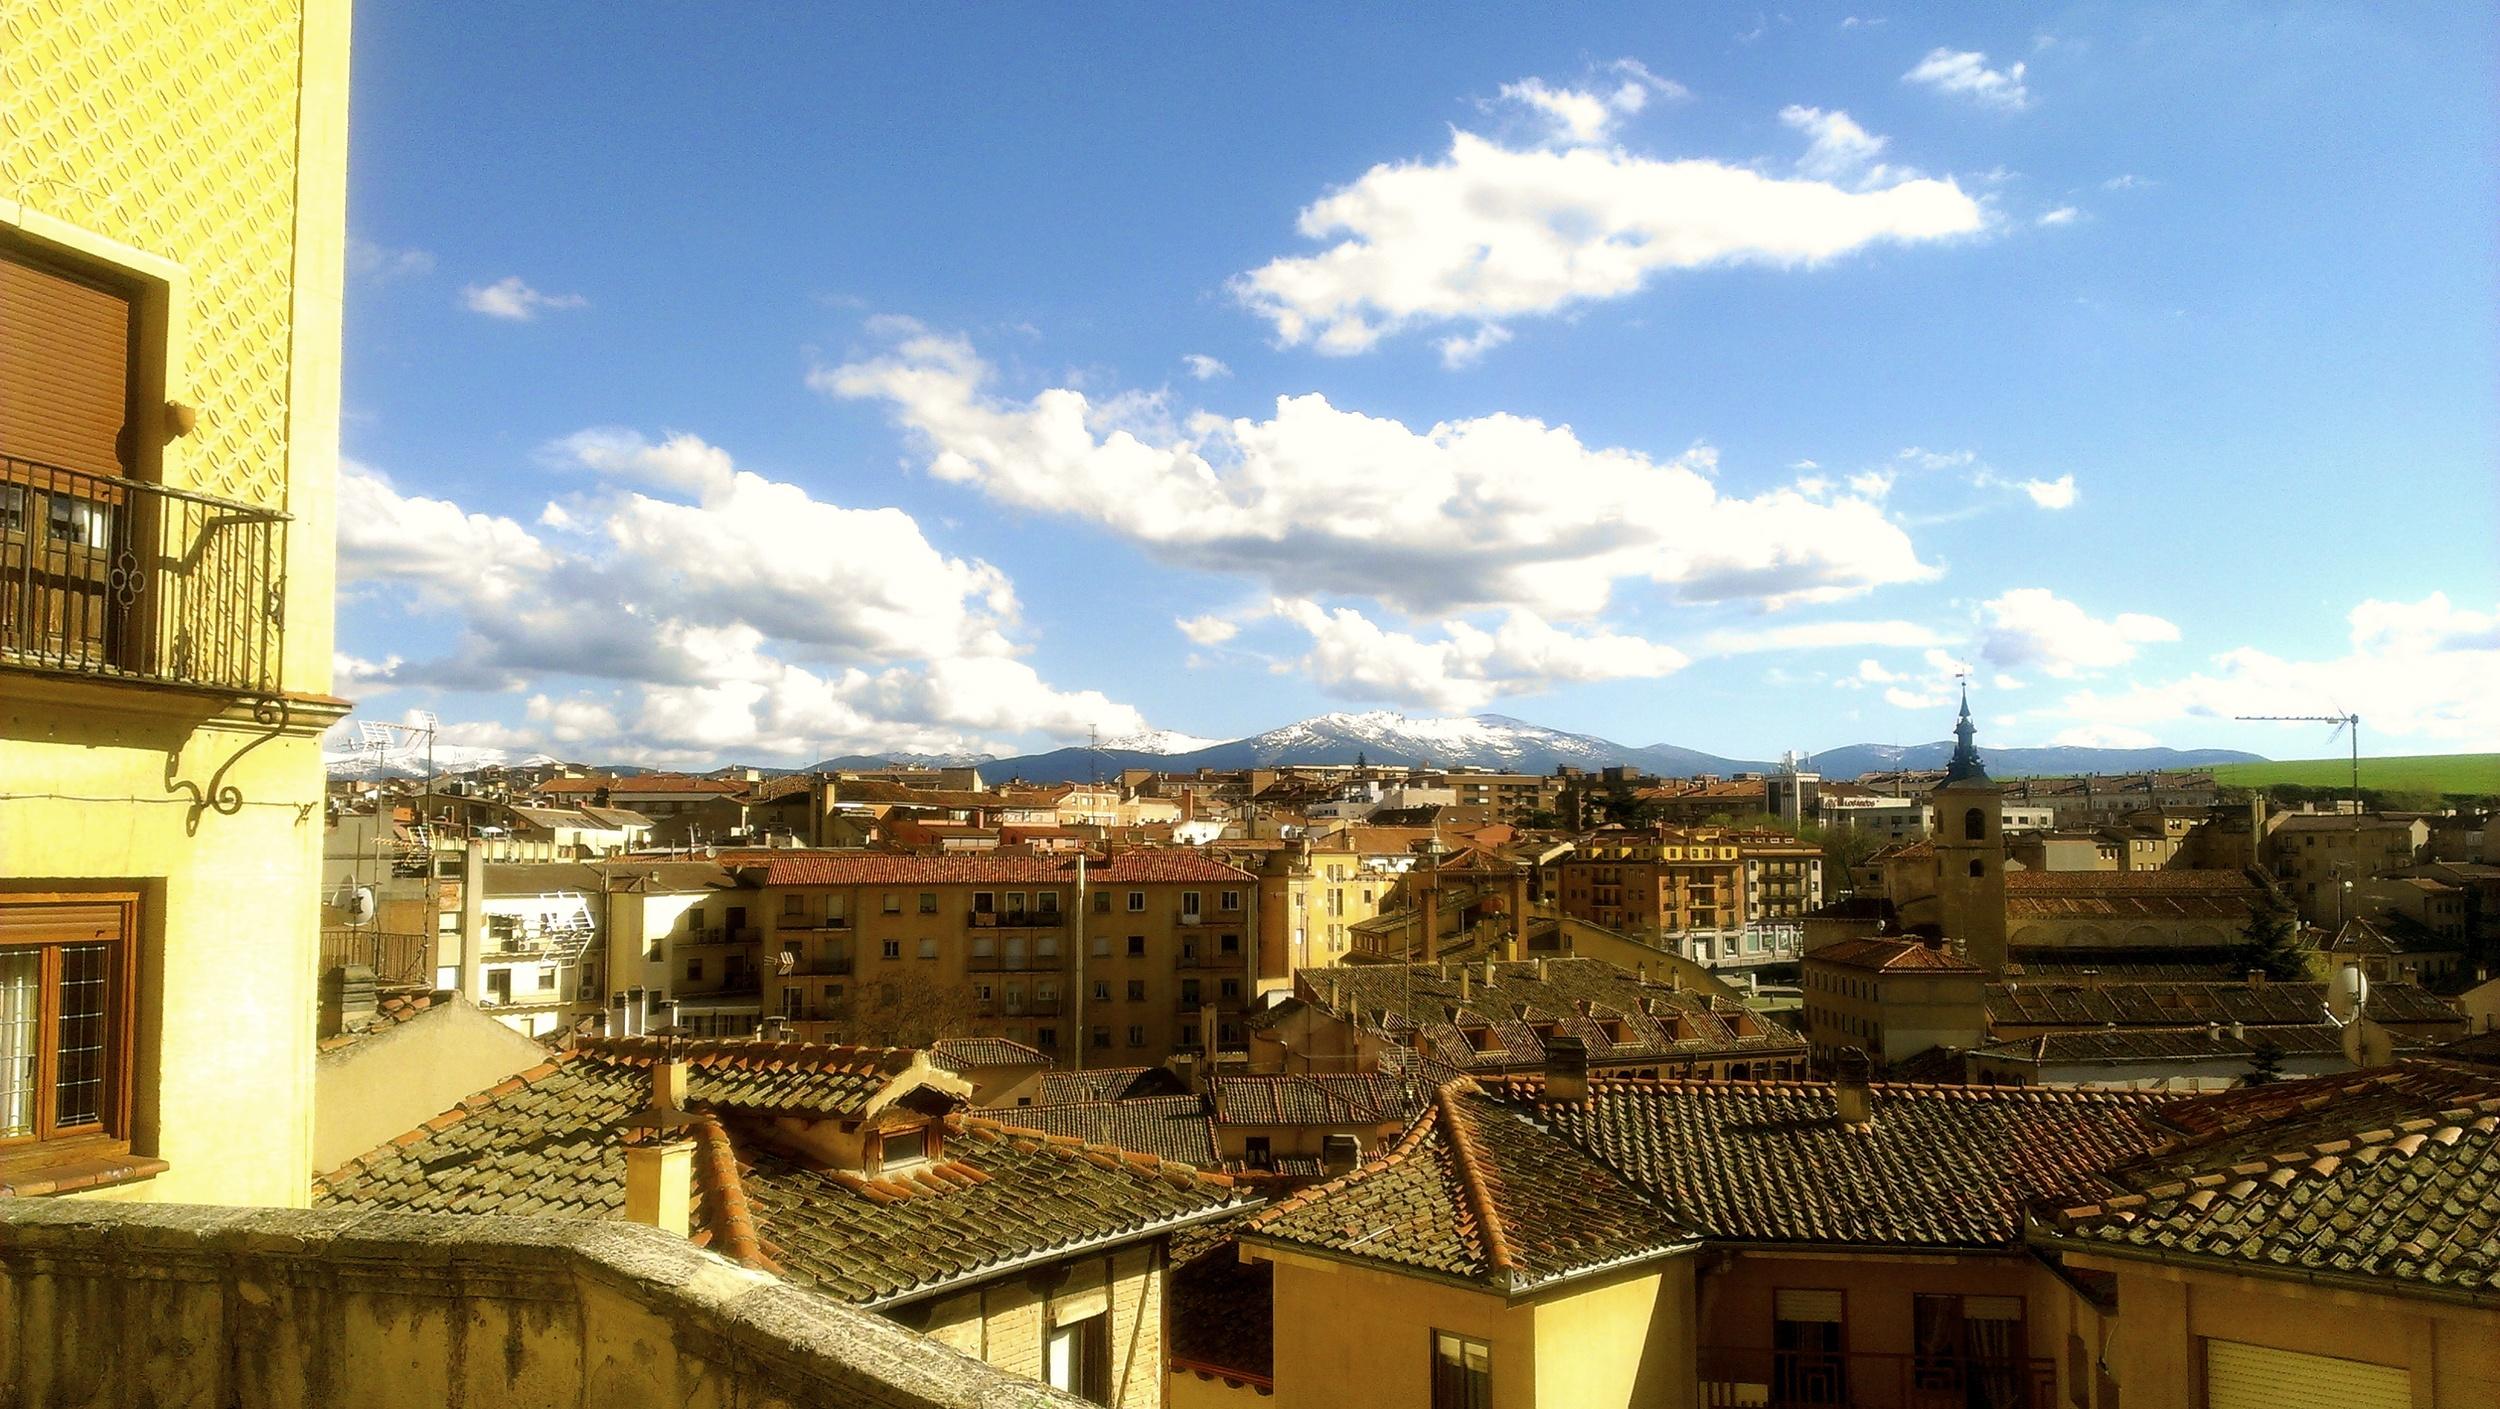 Segovia — PHOTO VIA DANNI ROSEMAN